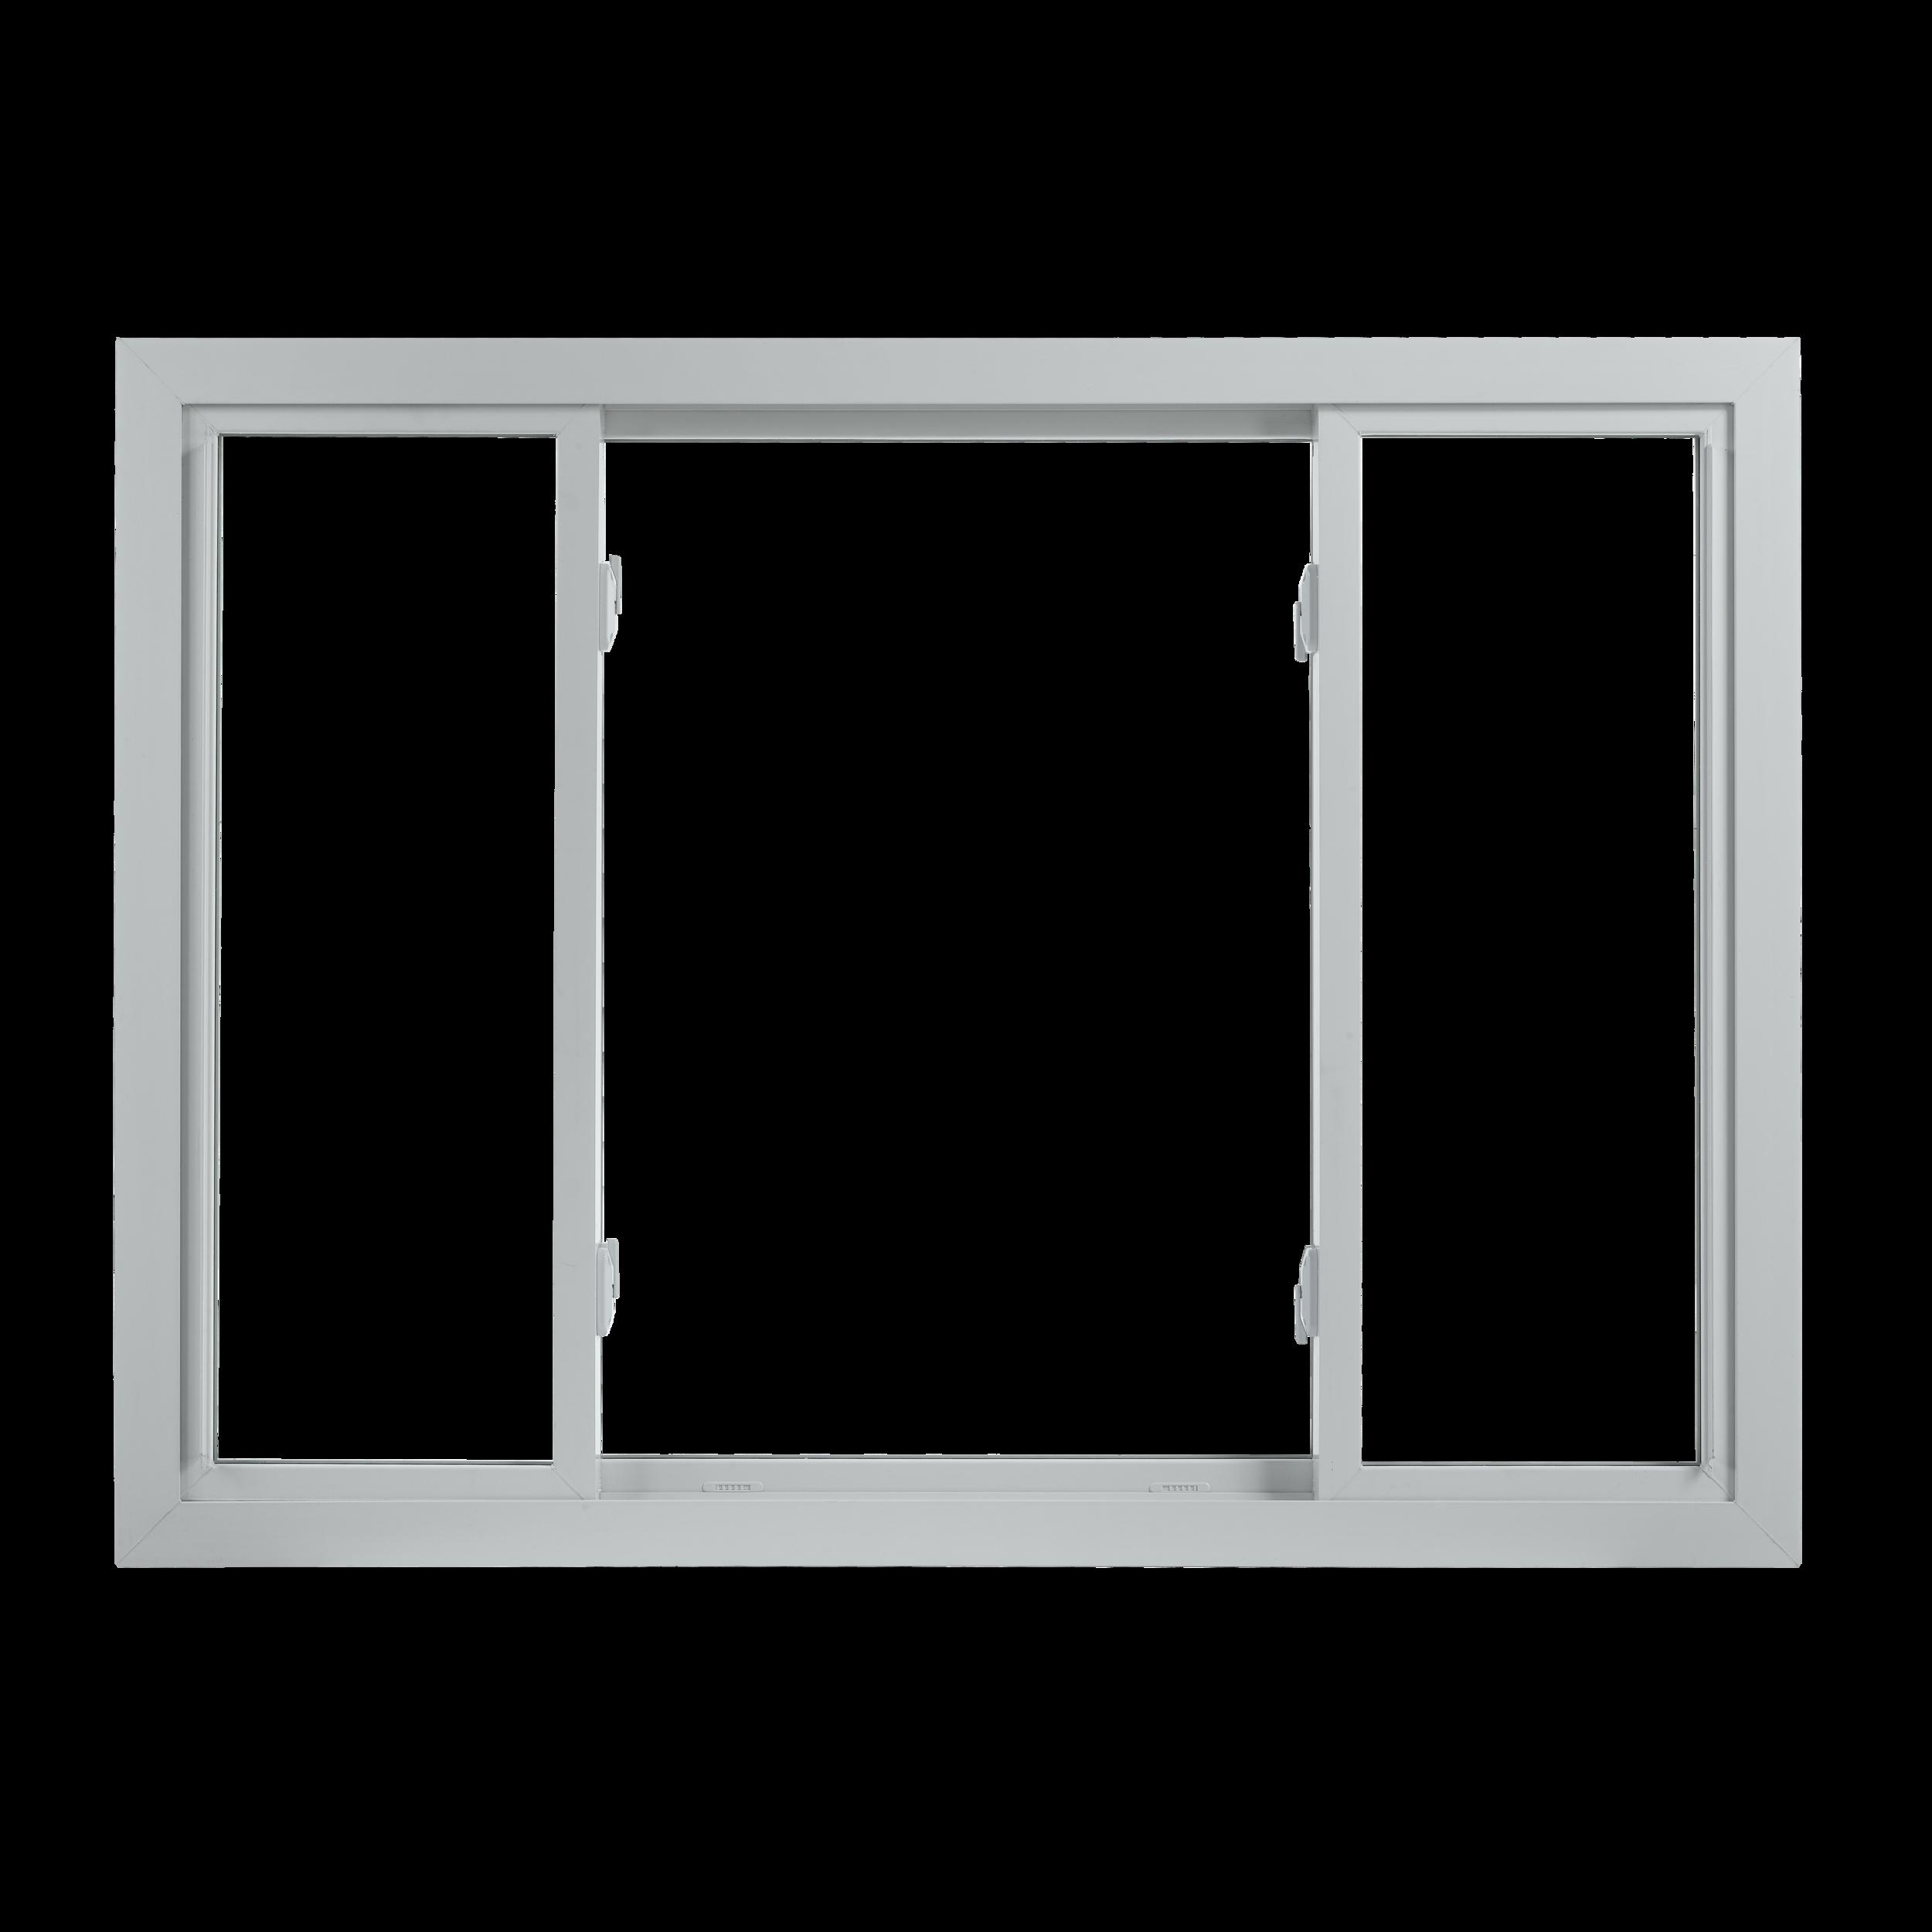 Wallside Windows End Vent Sliding Window